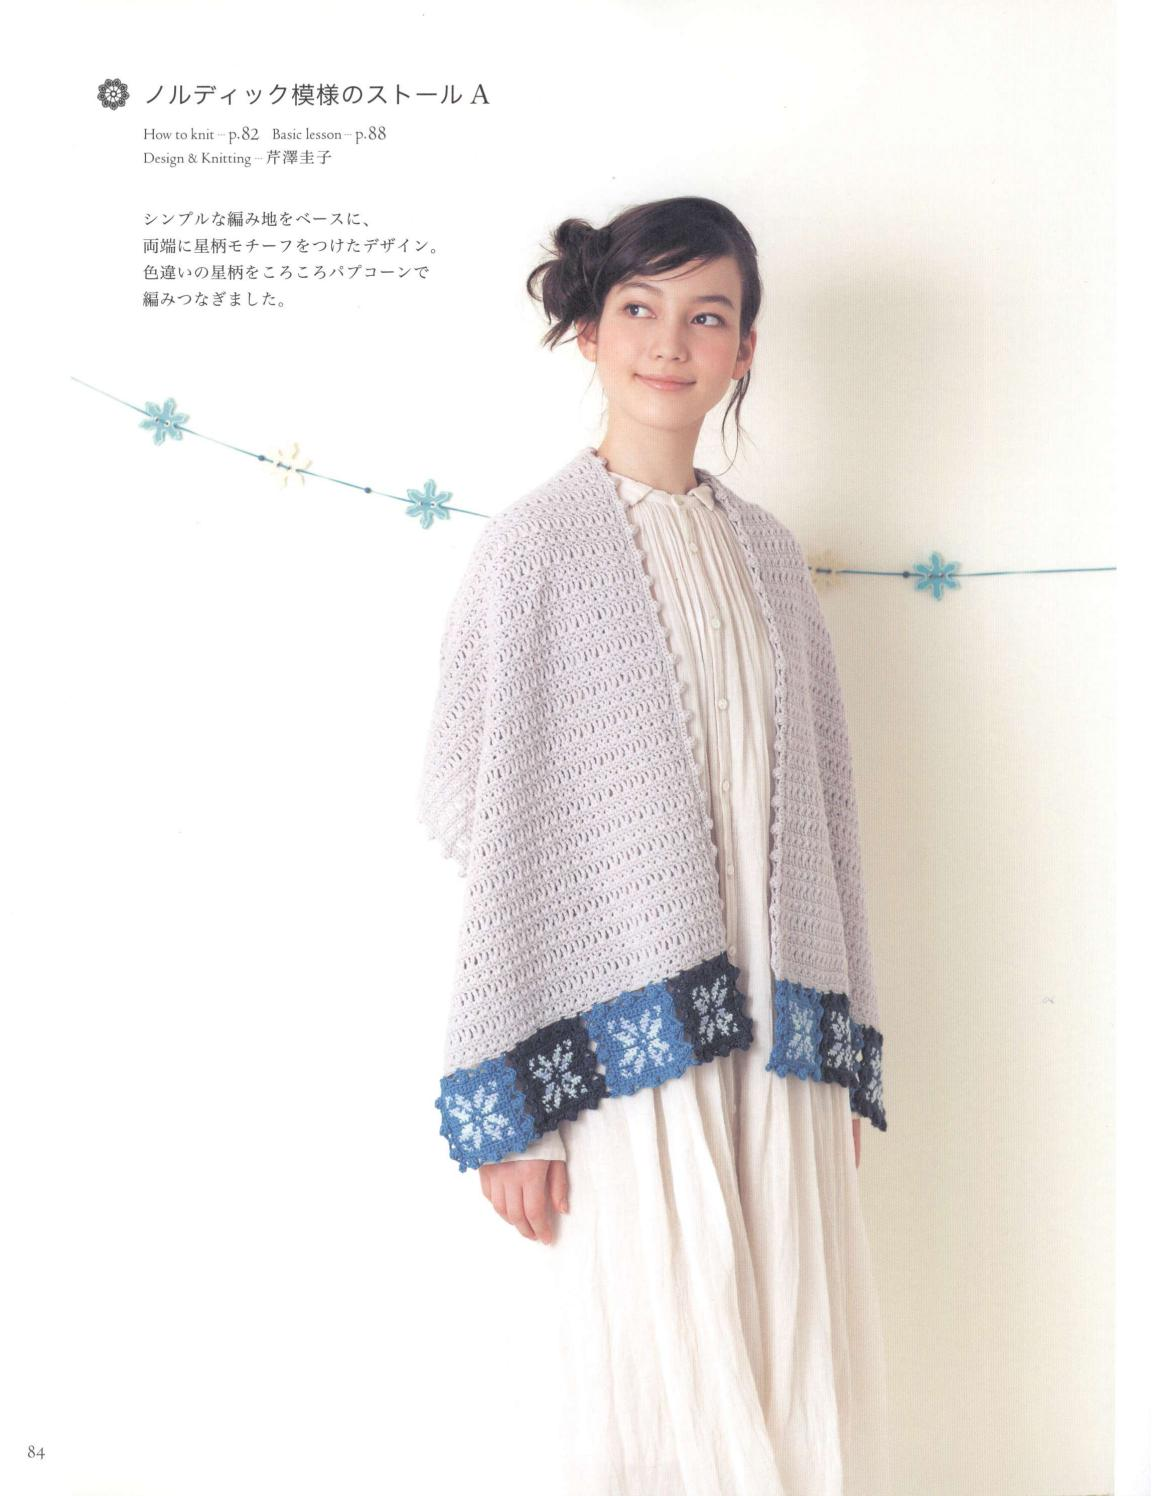 Asahi original crochet best selection 2012 page 84